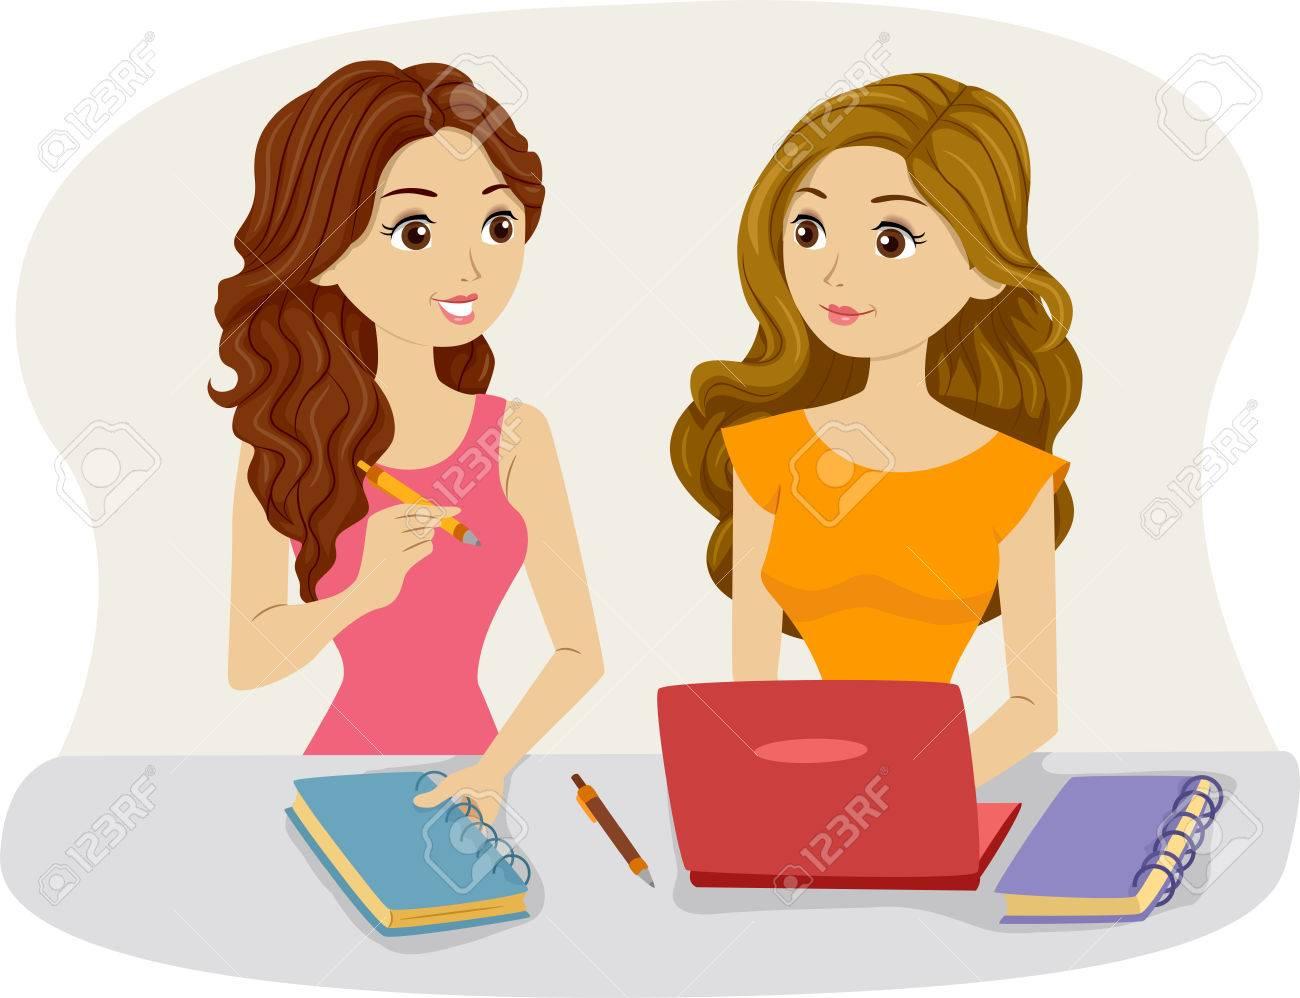 Illustration of Female Roommates Studying Together Stock Illustration - 22817729